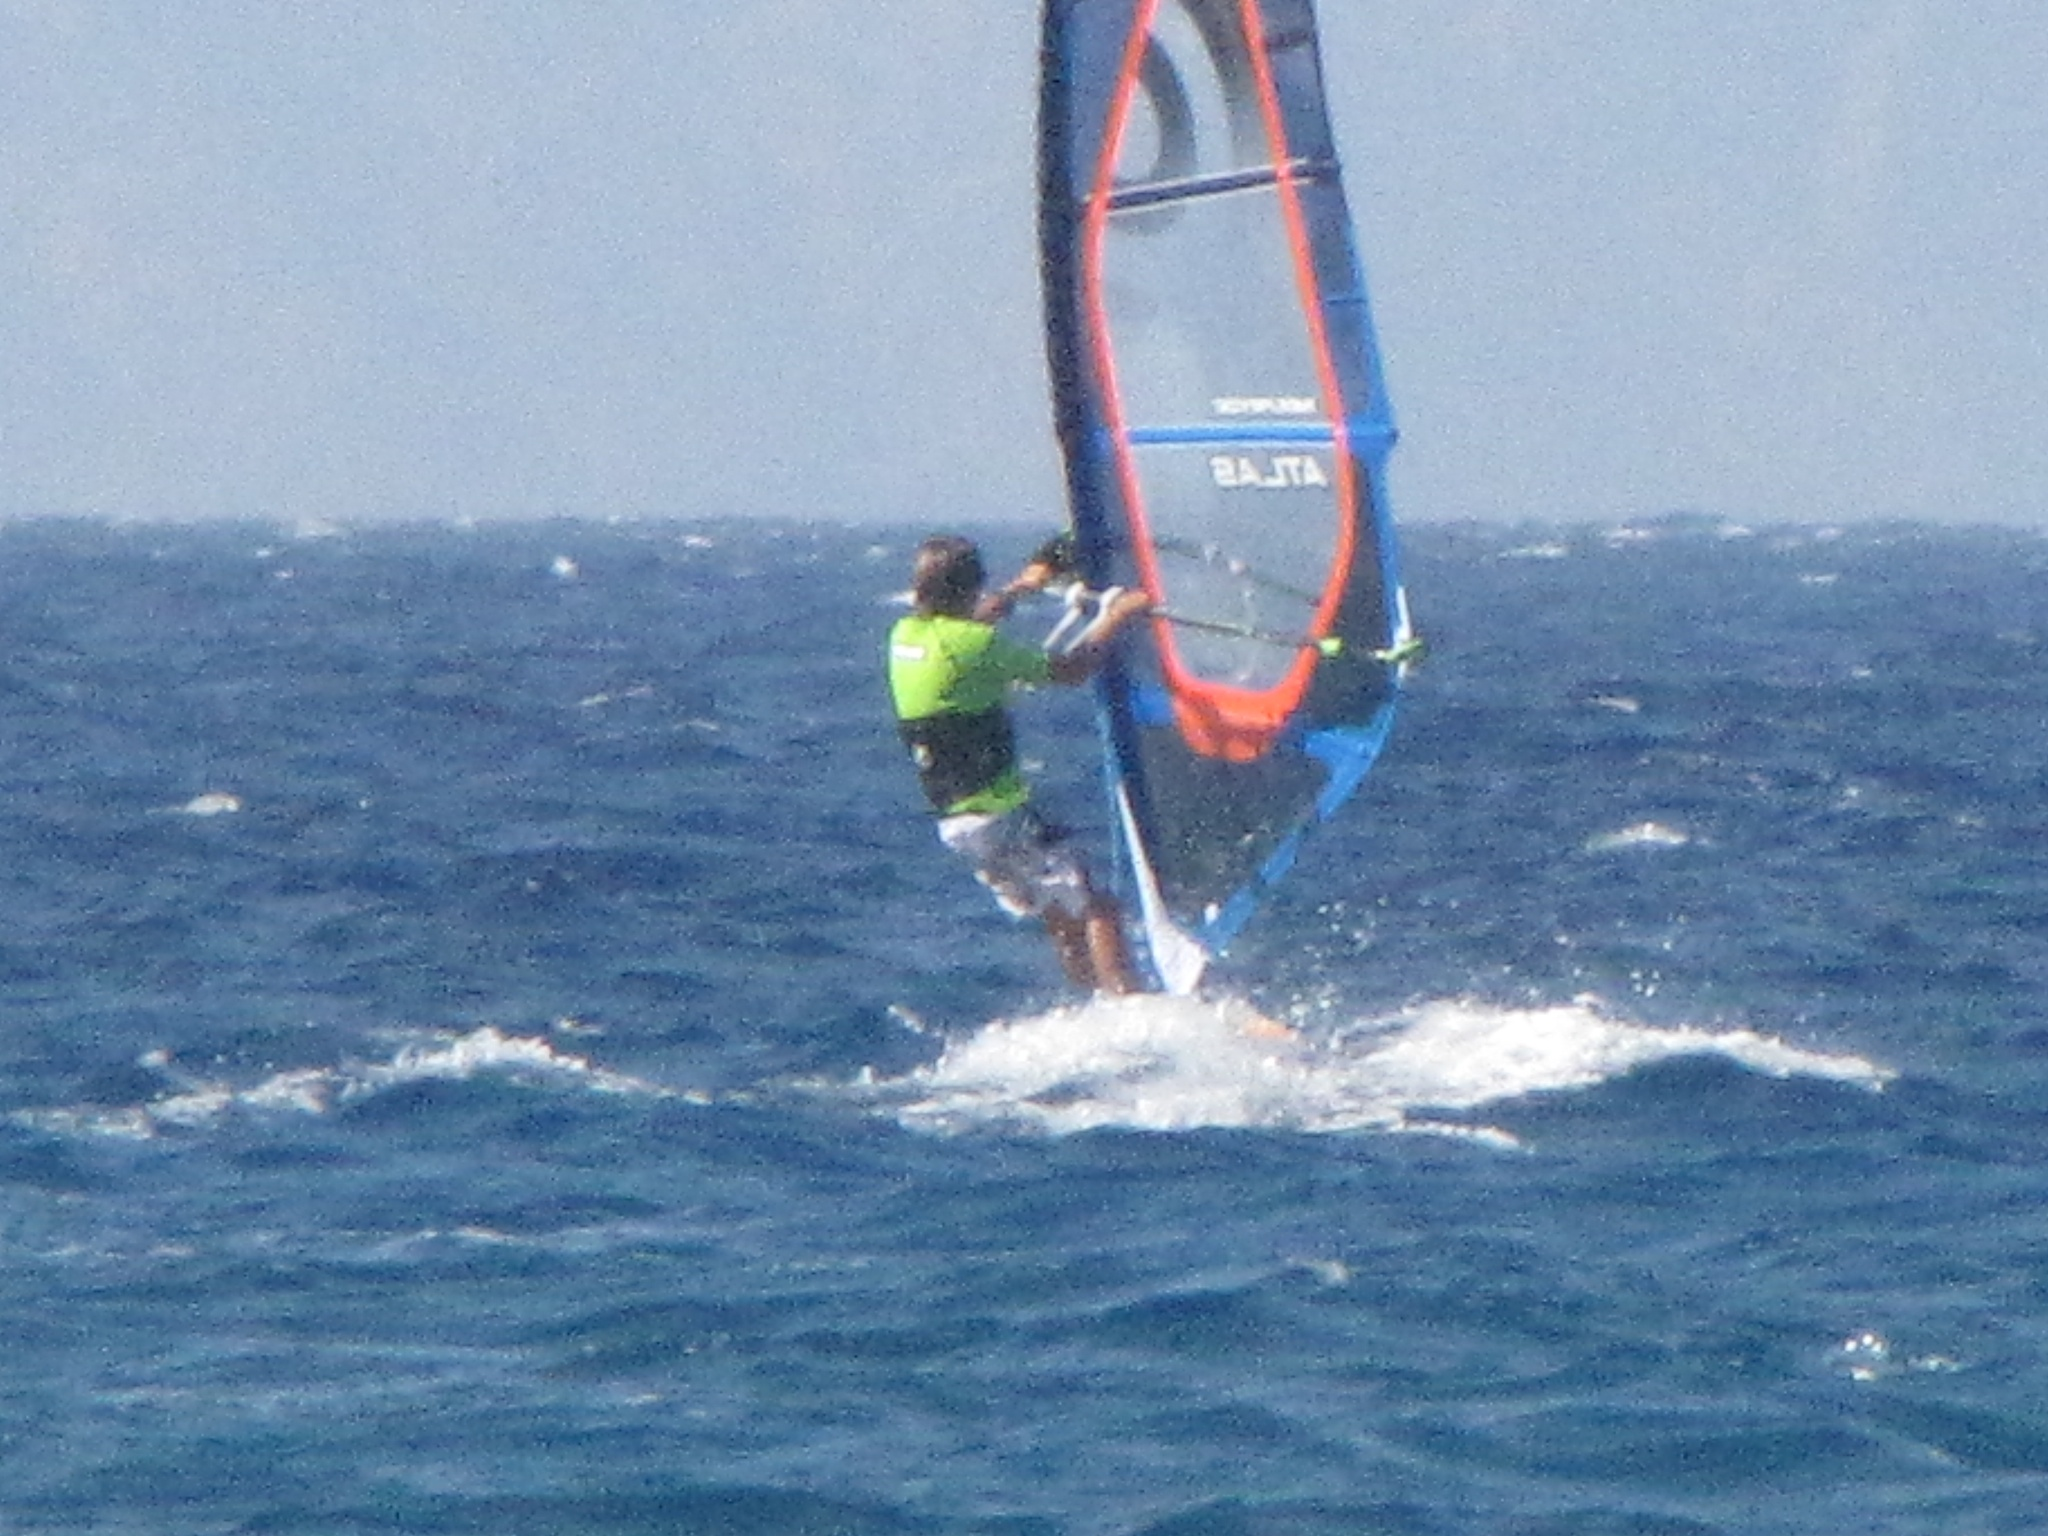 Cosa termoregoliamo tavole da windsurf tempco blog - Tavole da windsurf usate ...